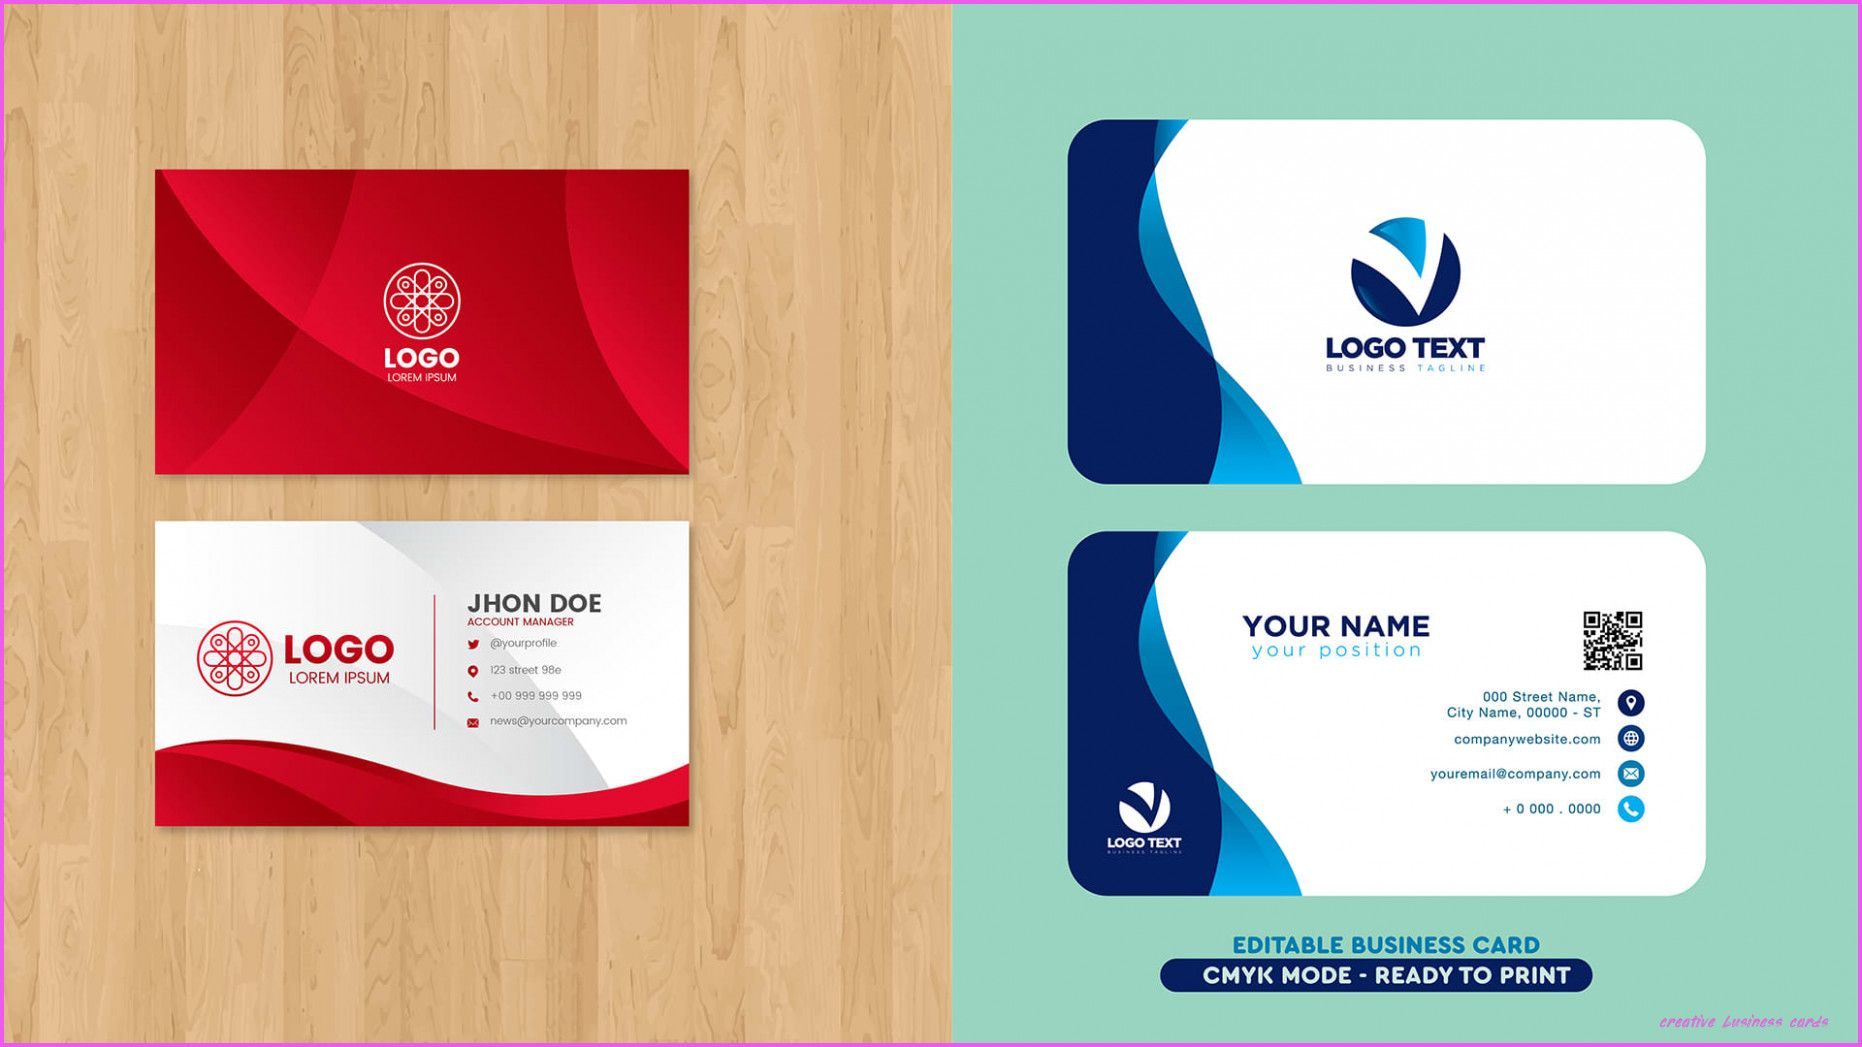 9 Doubts You Should Clarify About Creative Business Cards Creative Business Cards Htt Business Cards Creative Business Card Design Creative Creative Business